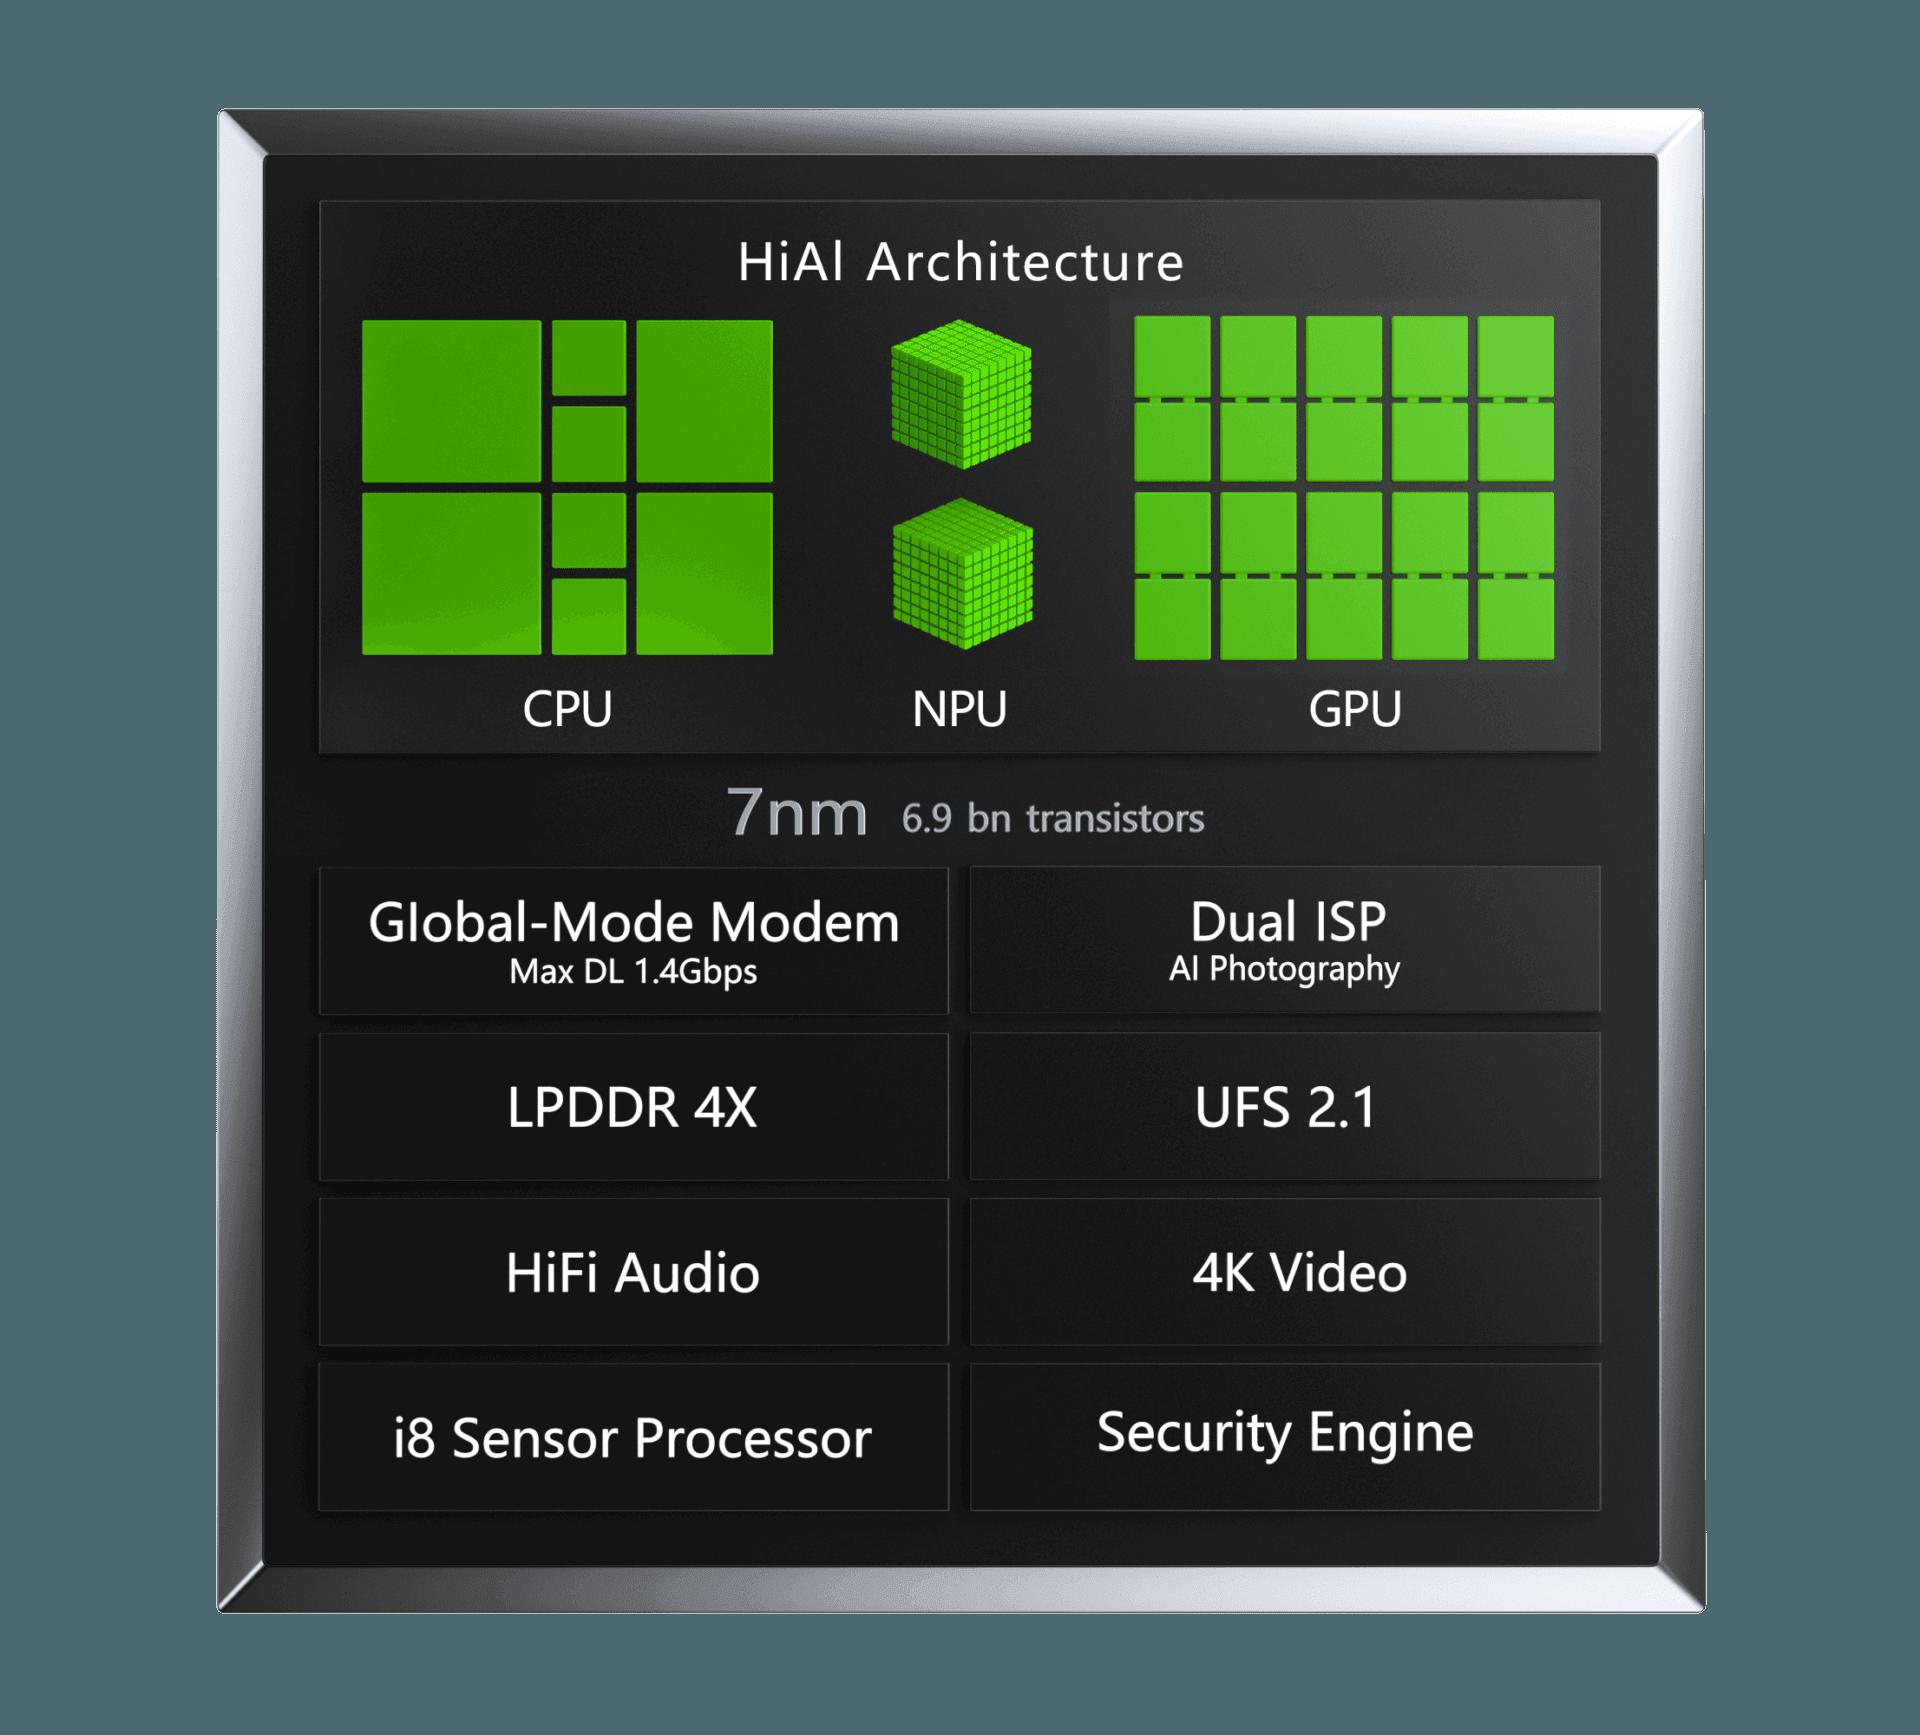 IFA 2019: Huawei stellt Kirin 980 SoC vor 12 techboys.de • smarte News, auf den Punkt! IFA 2019: Huawei stellt Kirin 980 SoC vor